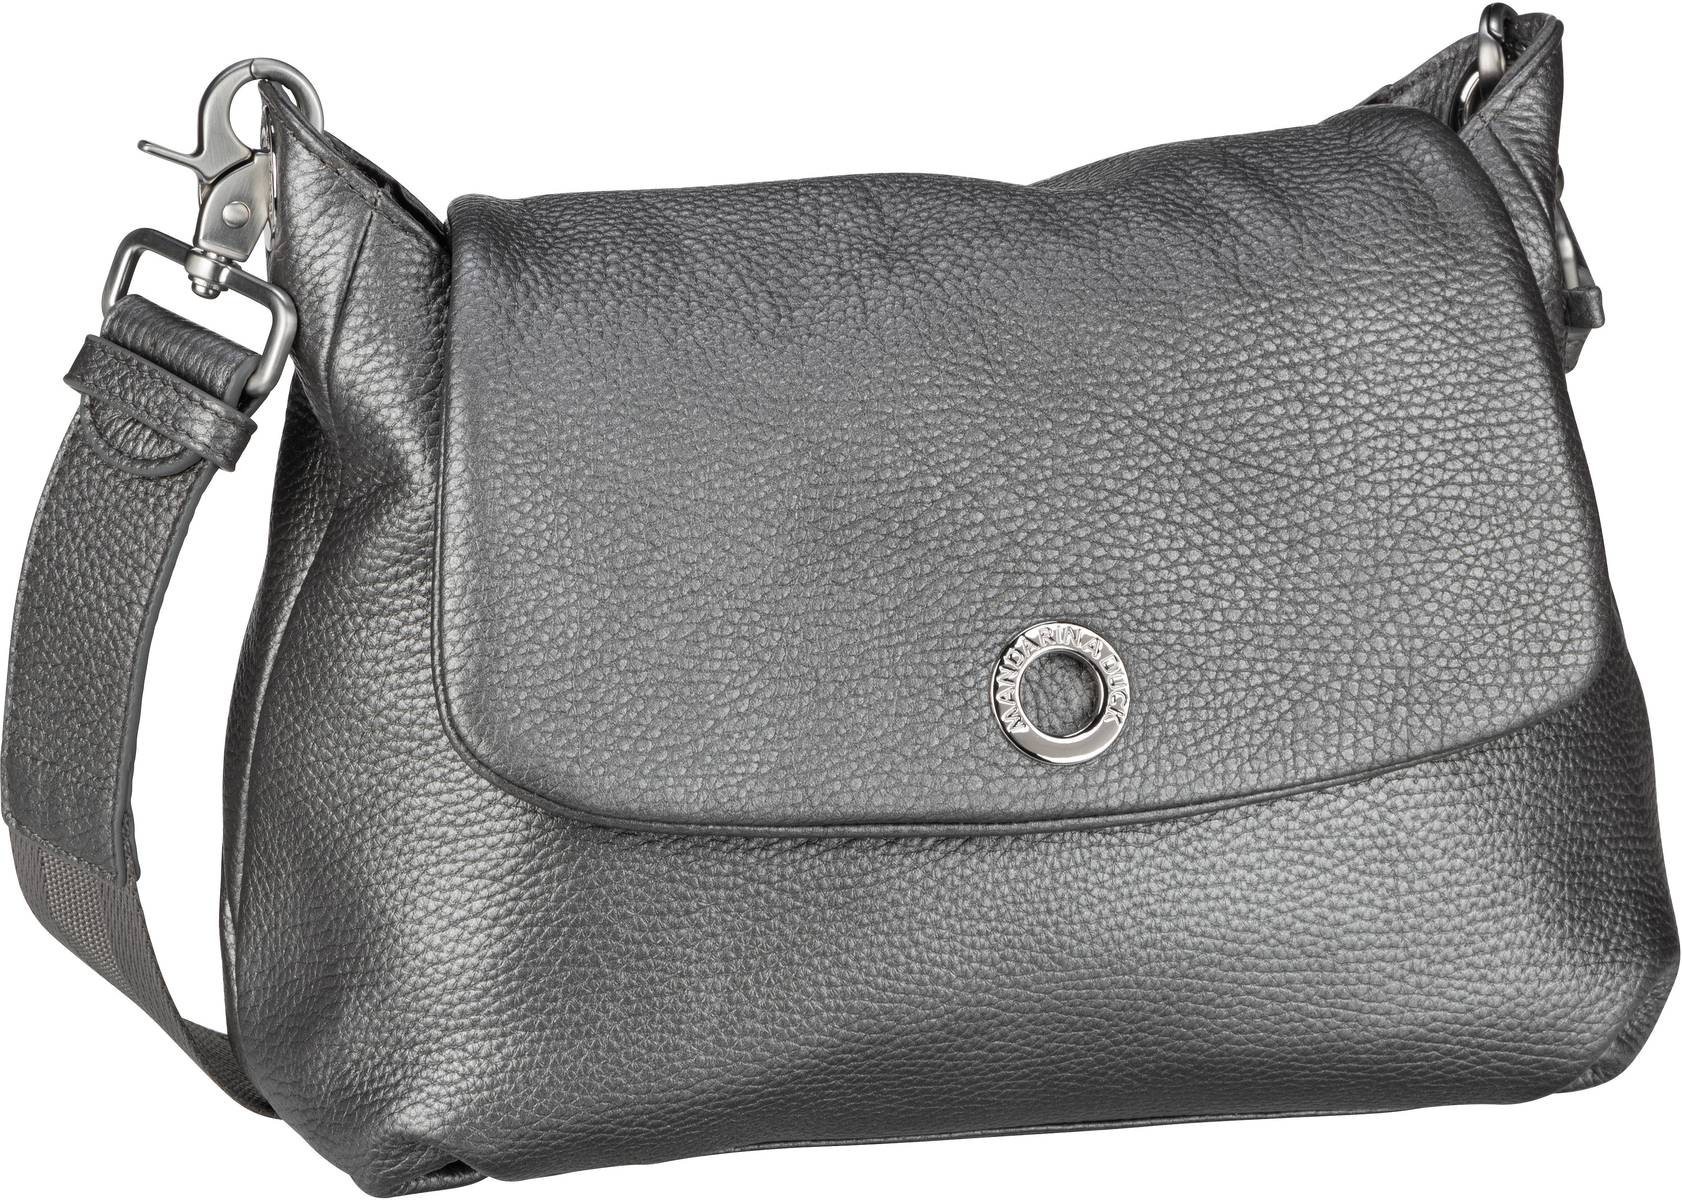 Umhängetasche Mellow Leather Lux Small Shoulder Bag ZLT31 Lead